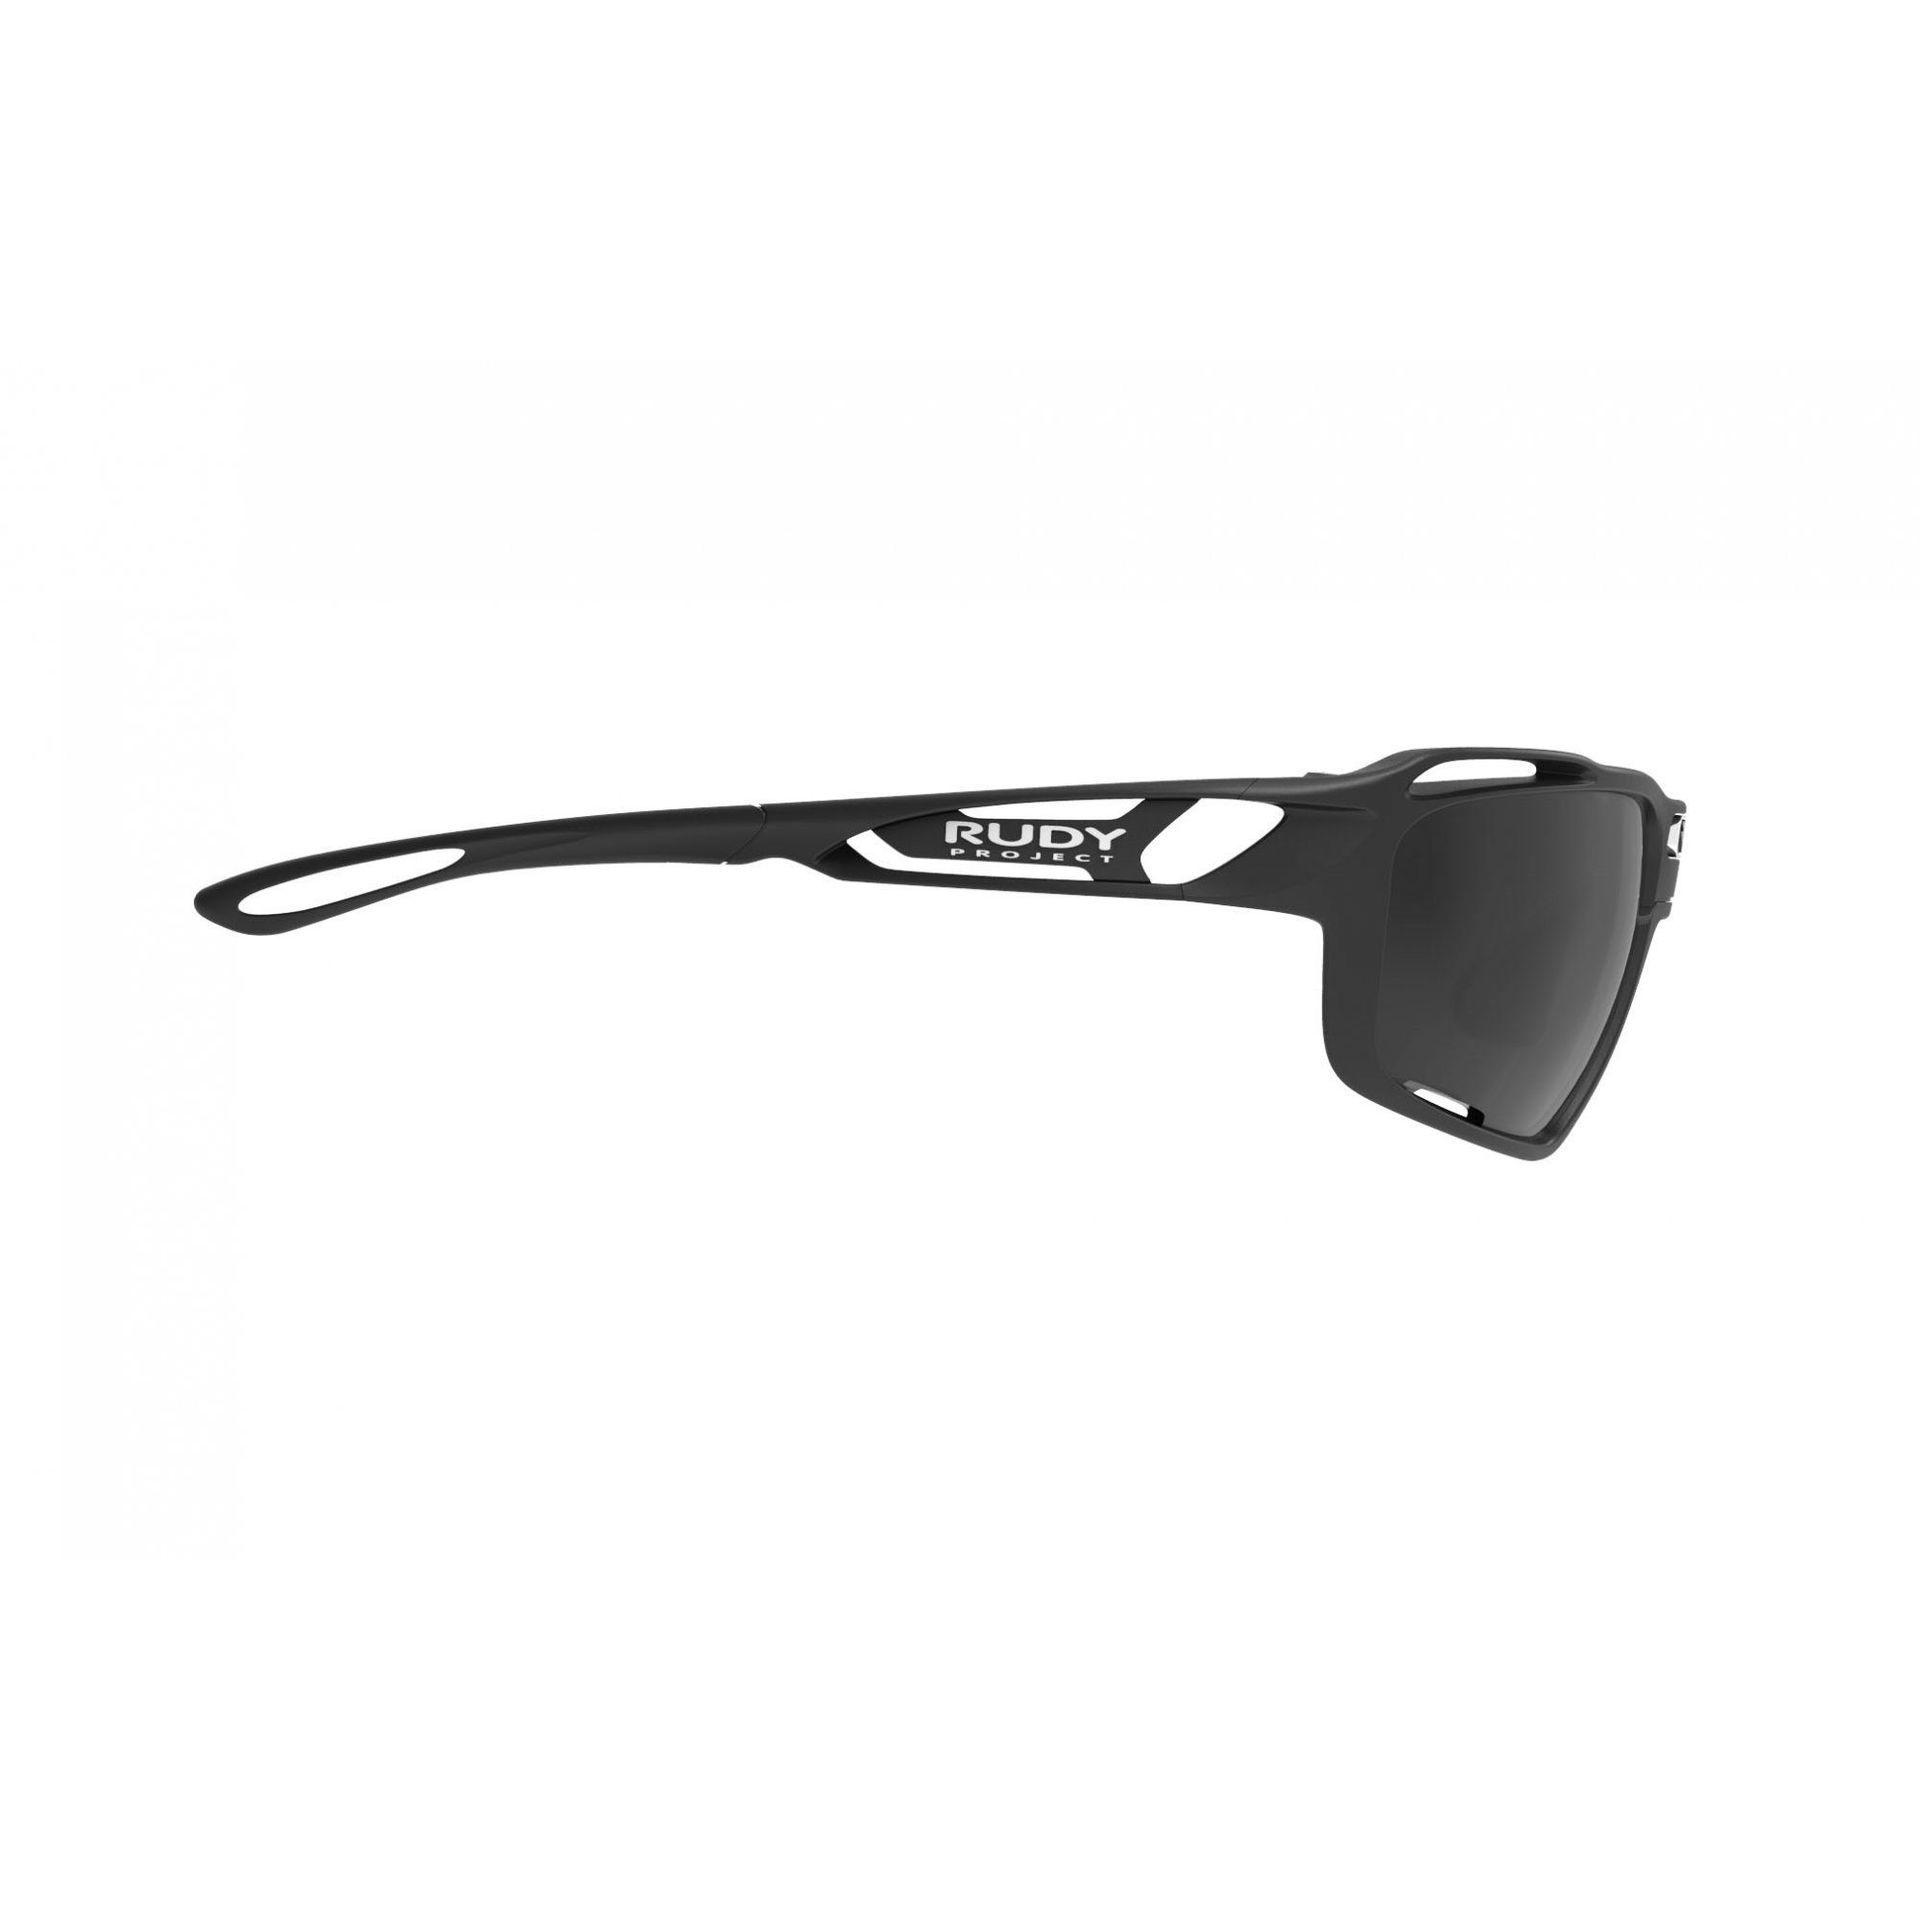 OKULARY RUDY PROJECT SINTRYX BLACK + SMOKE|TRANS SP491006 4